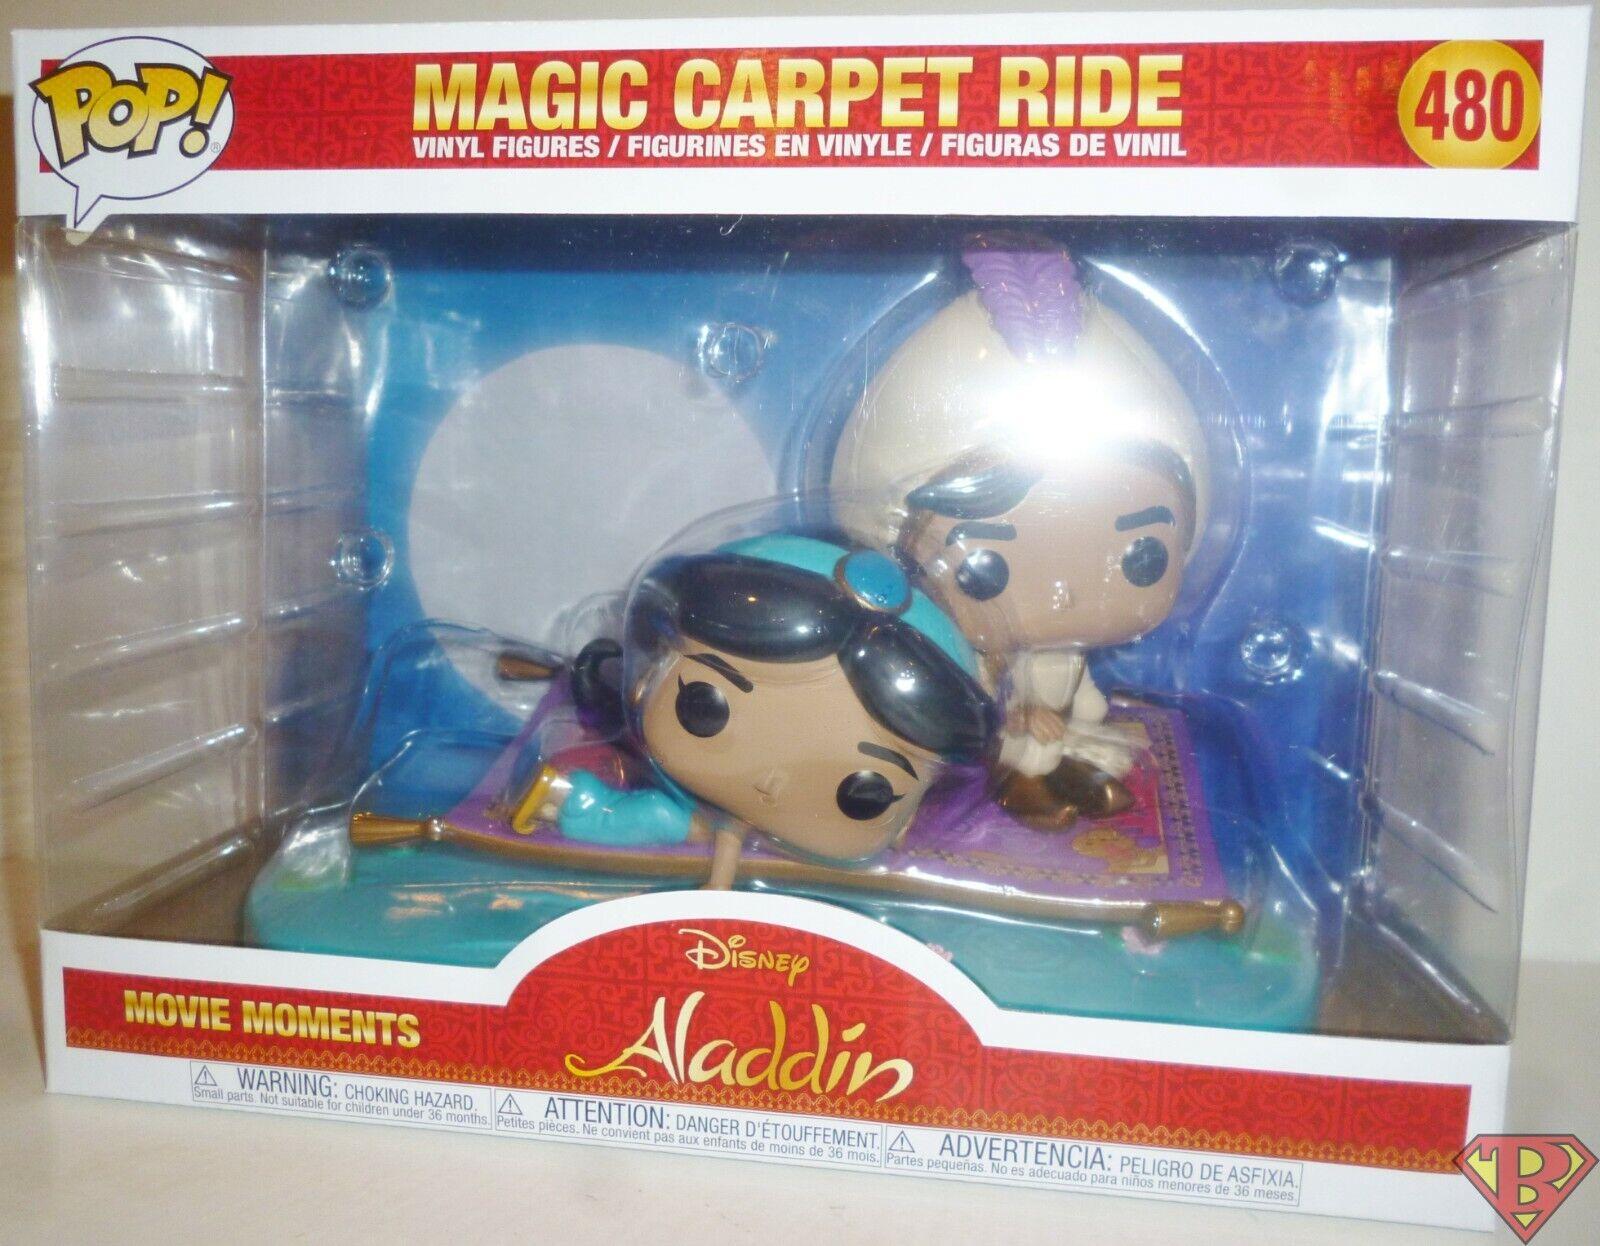 Figurine Funko Pop Movie Moment Disney Aladdin Magic Carpet Ride 2Pack